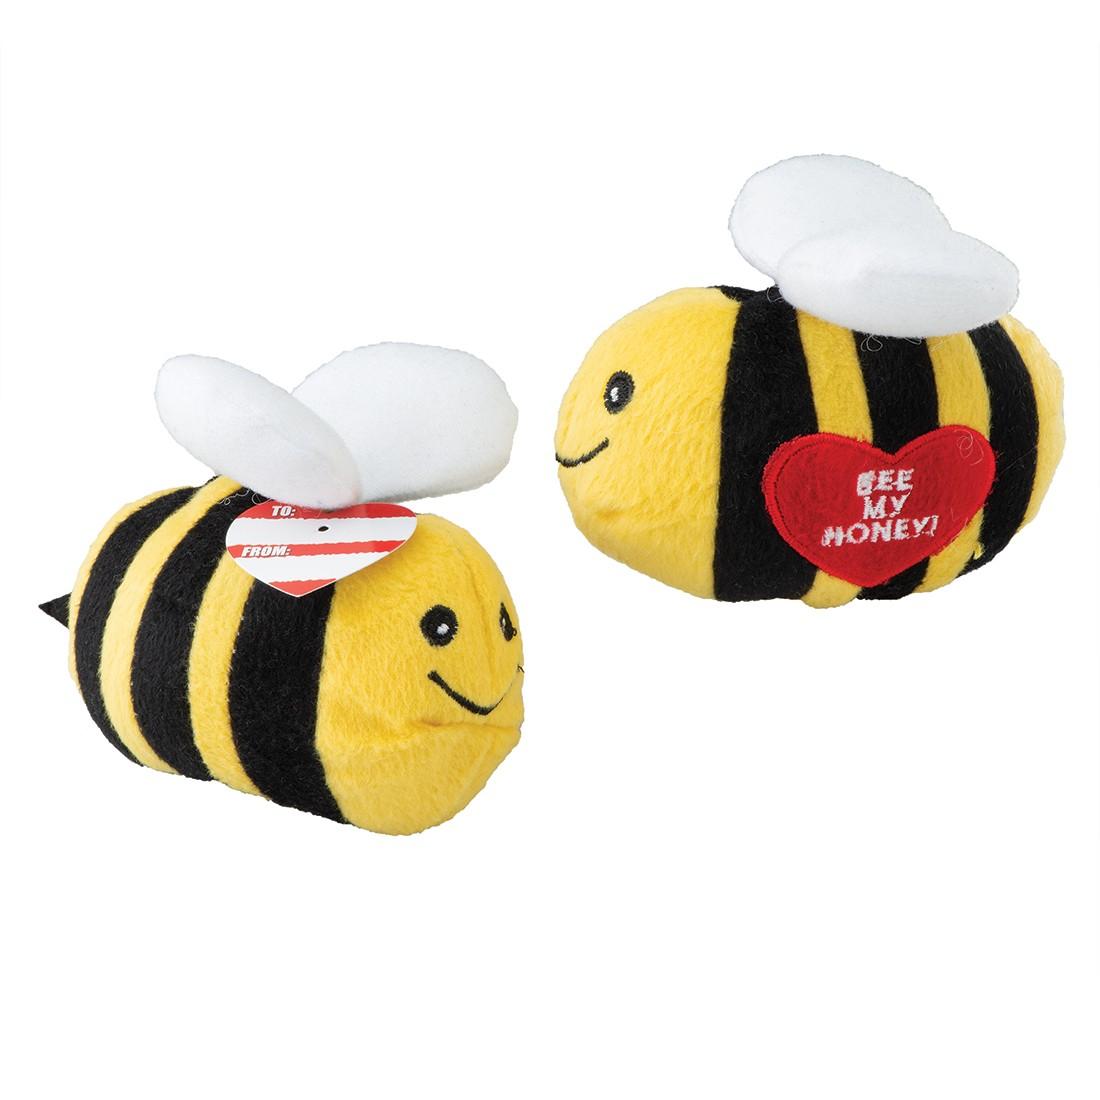 Plush Valentine Honey Bees   [image]